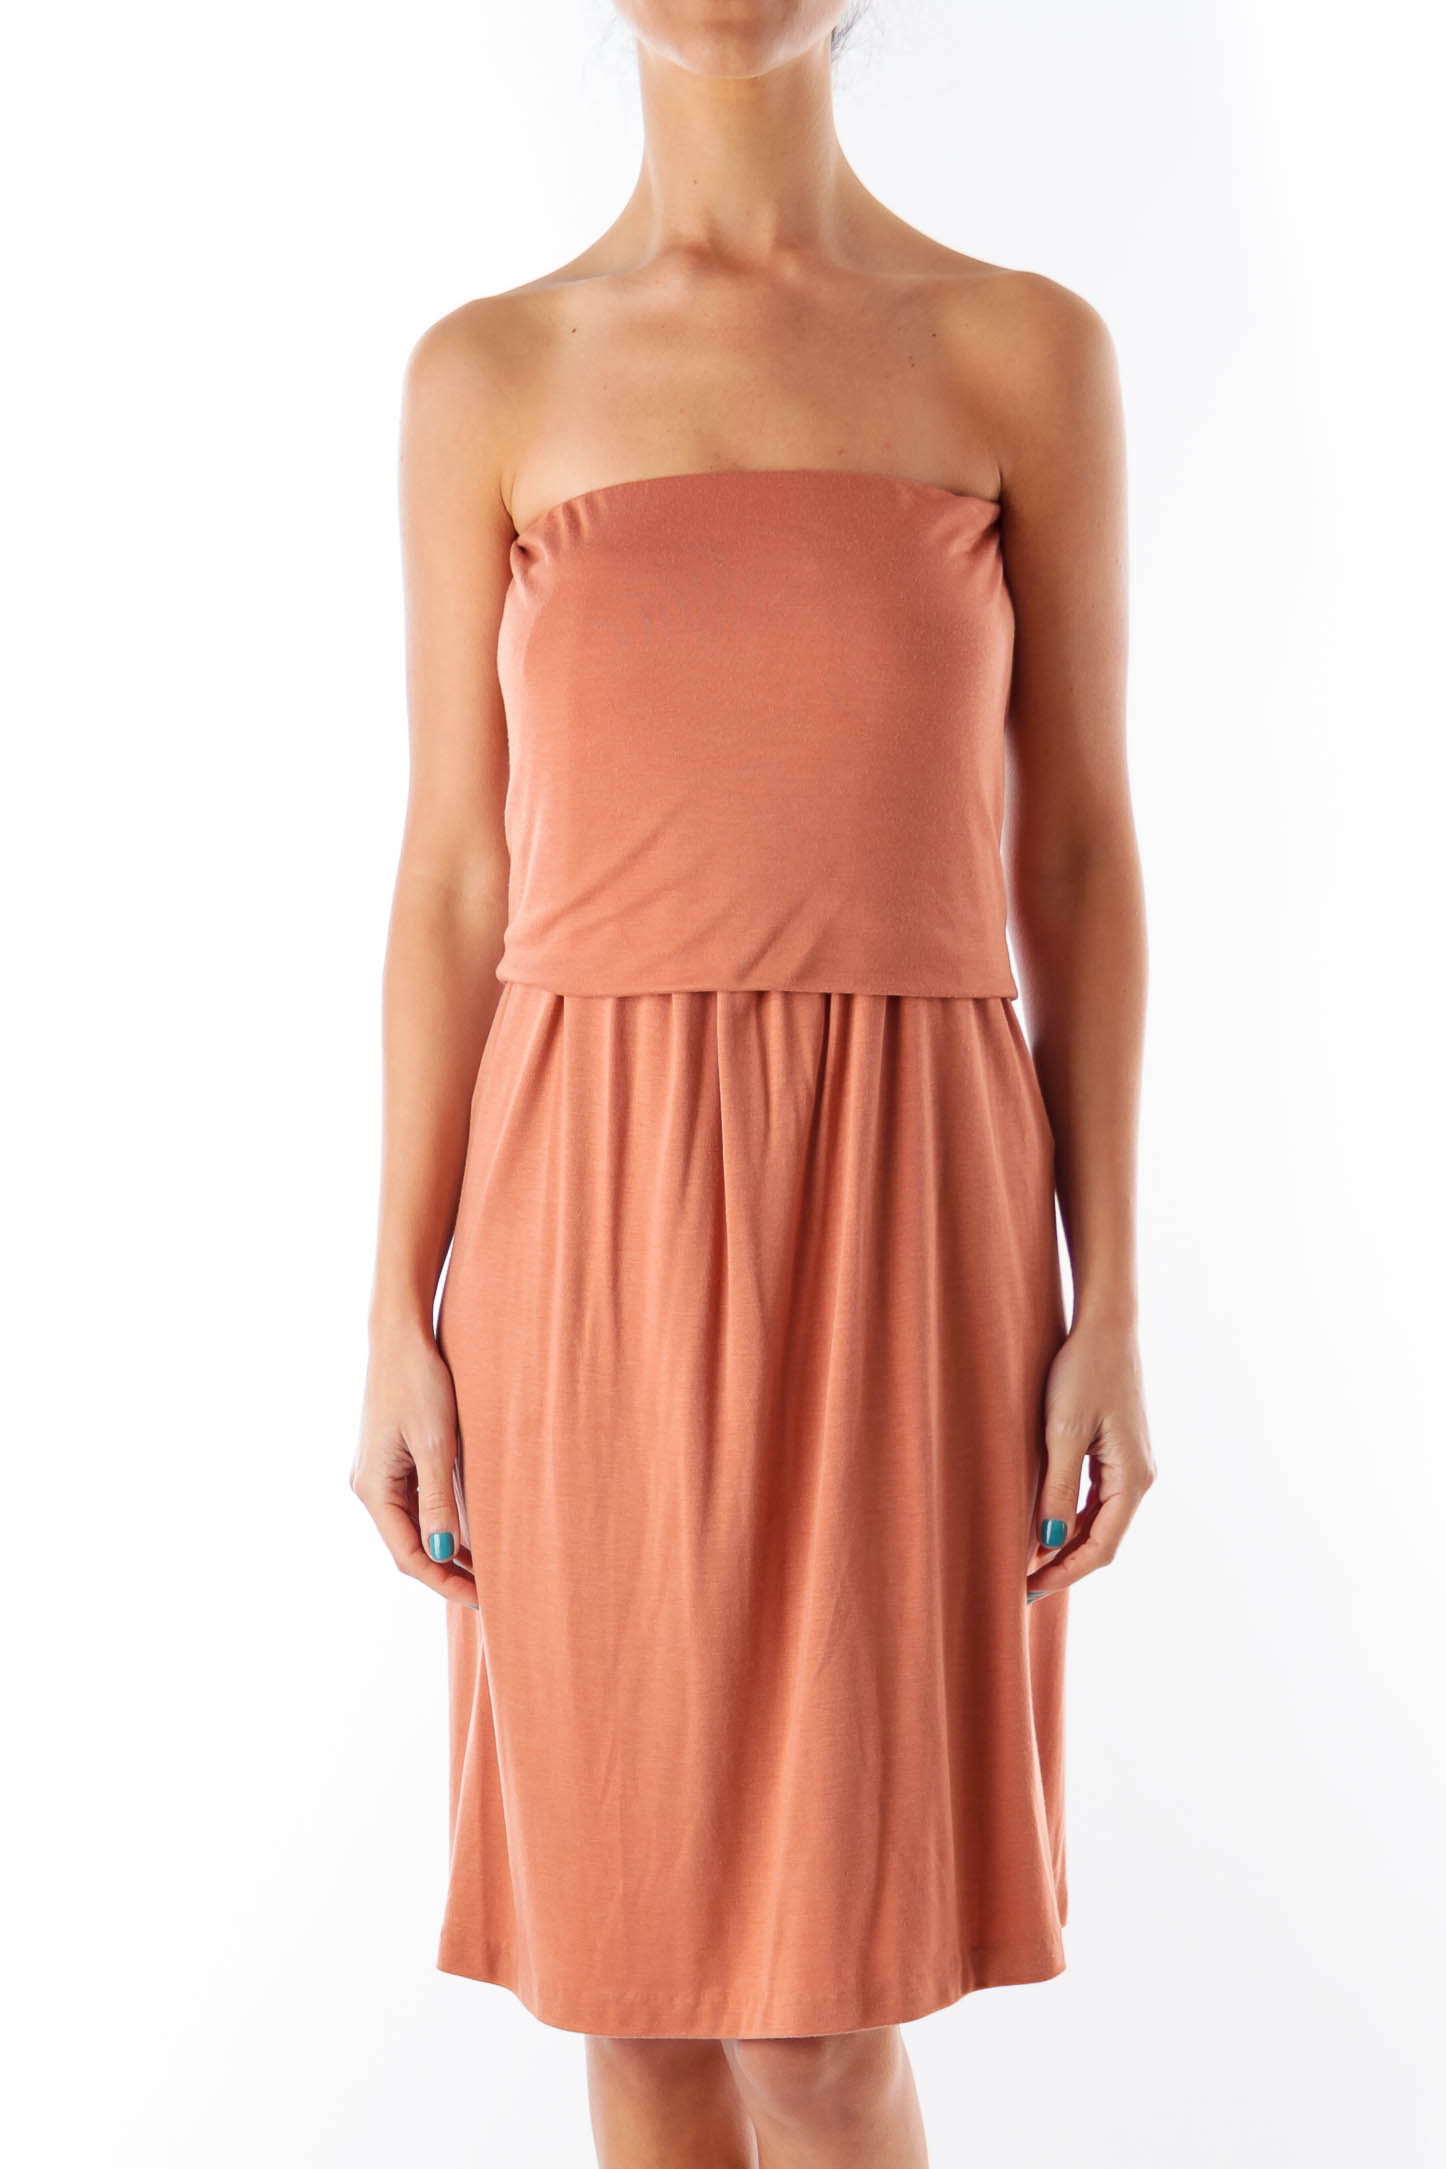 Shop Brown Strapless Mini Dress clothing and handbags at SilkRoll ... 2a830e665bac4